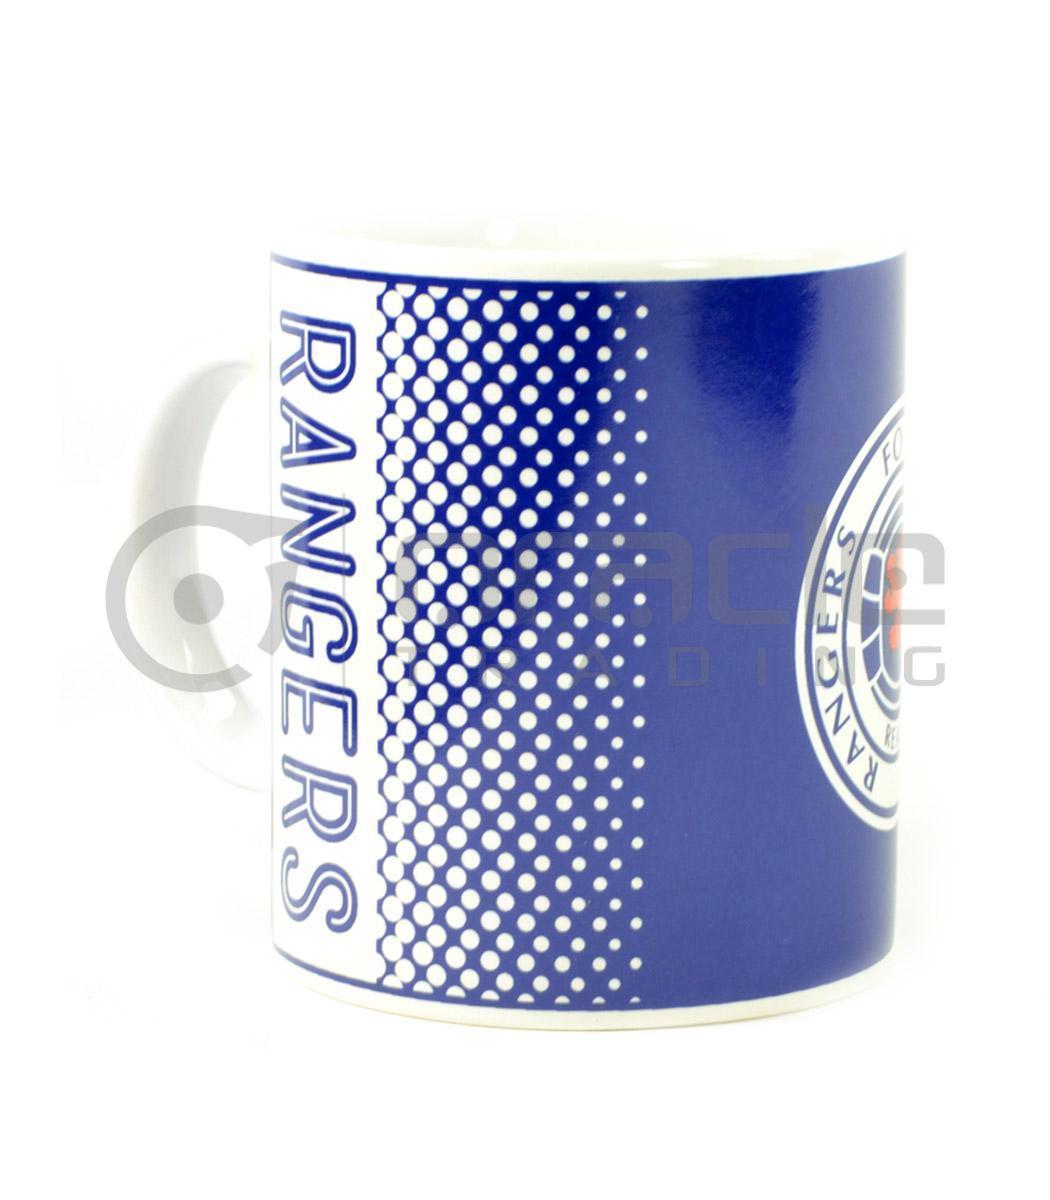 Rangers FC Mug - Crest